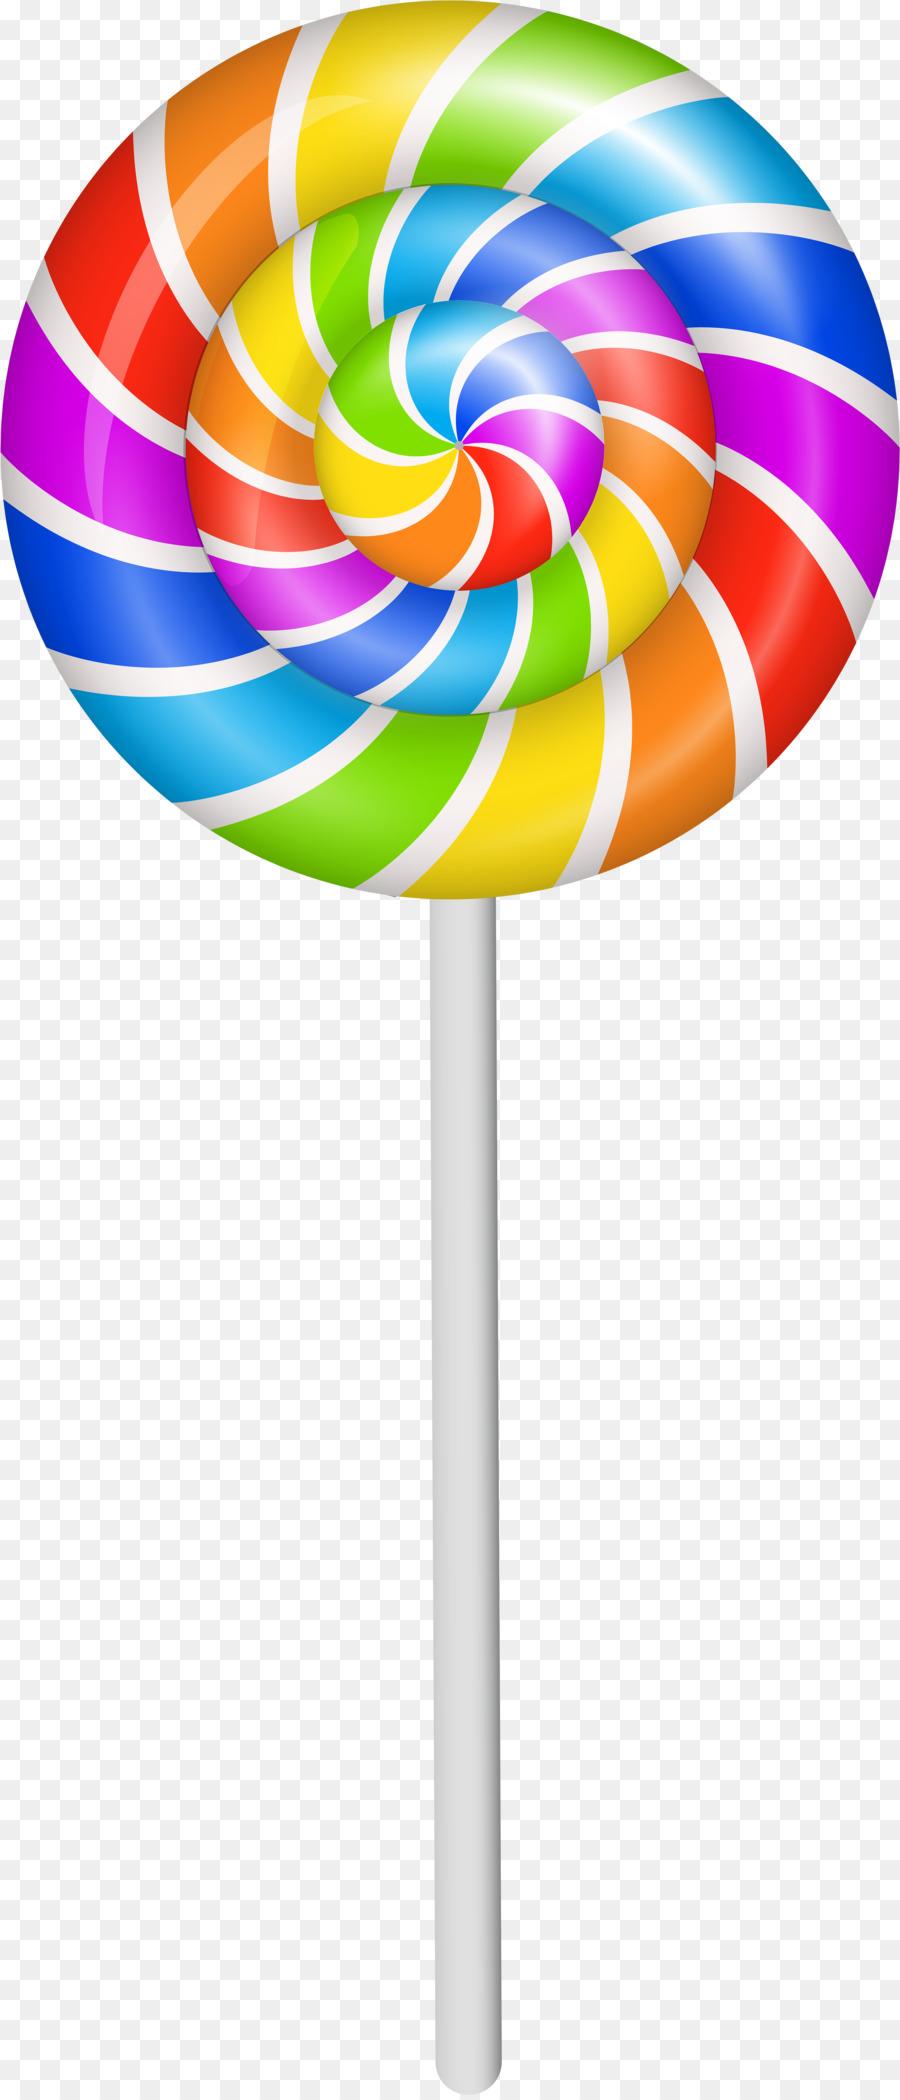 Lollipop Cartoon.